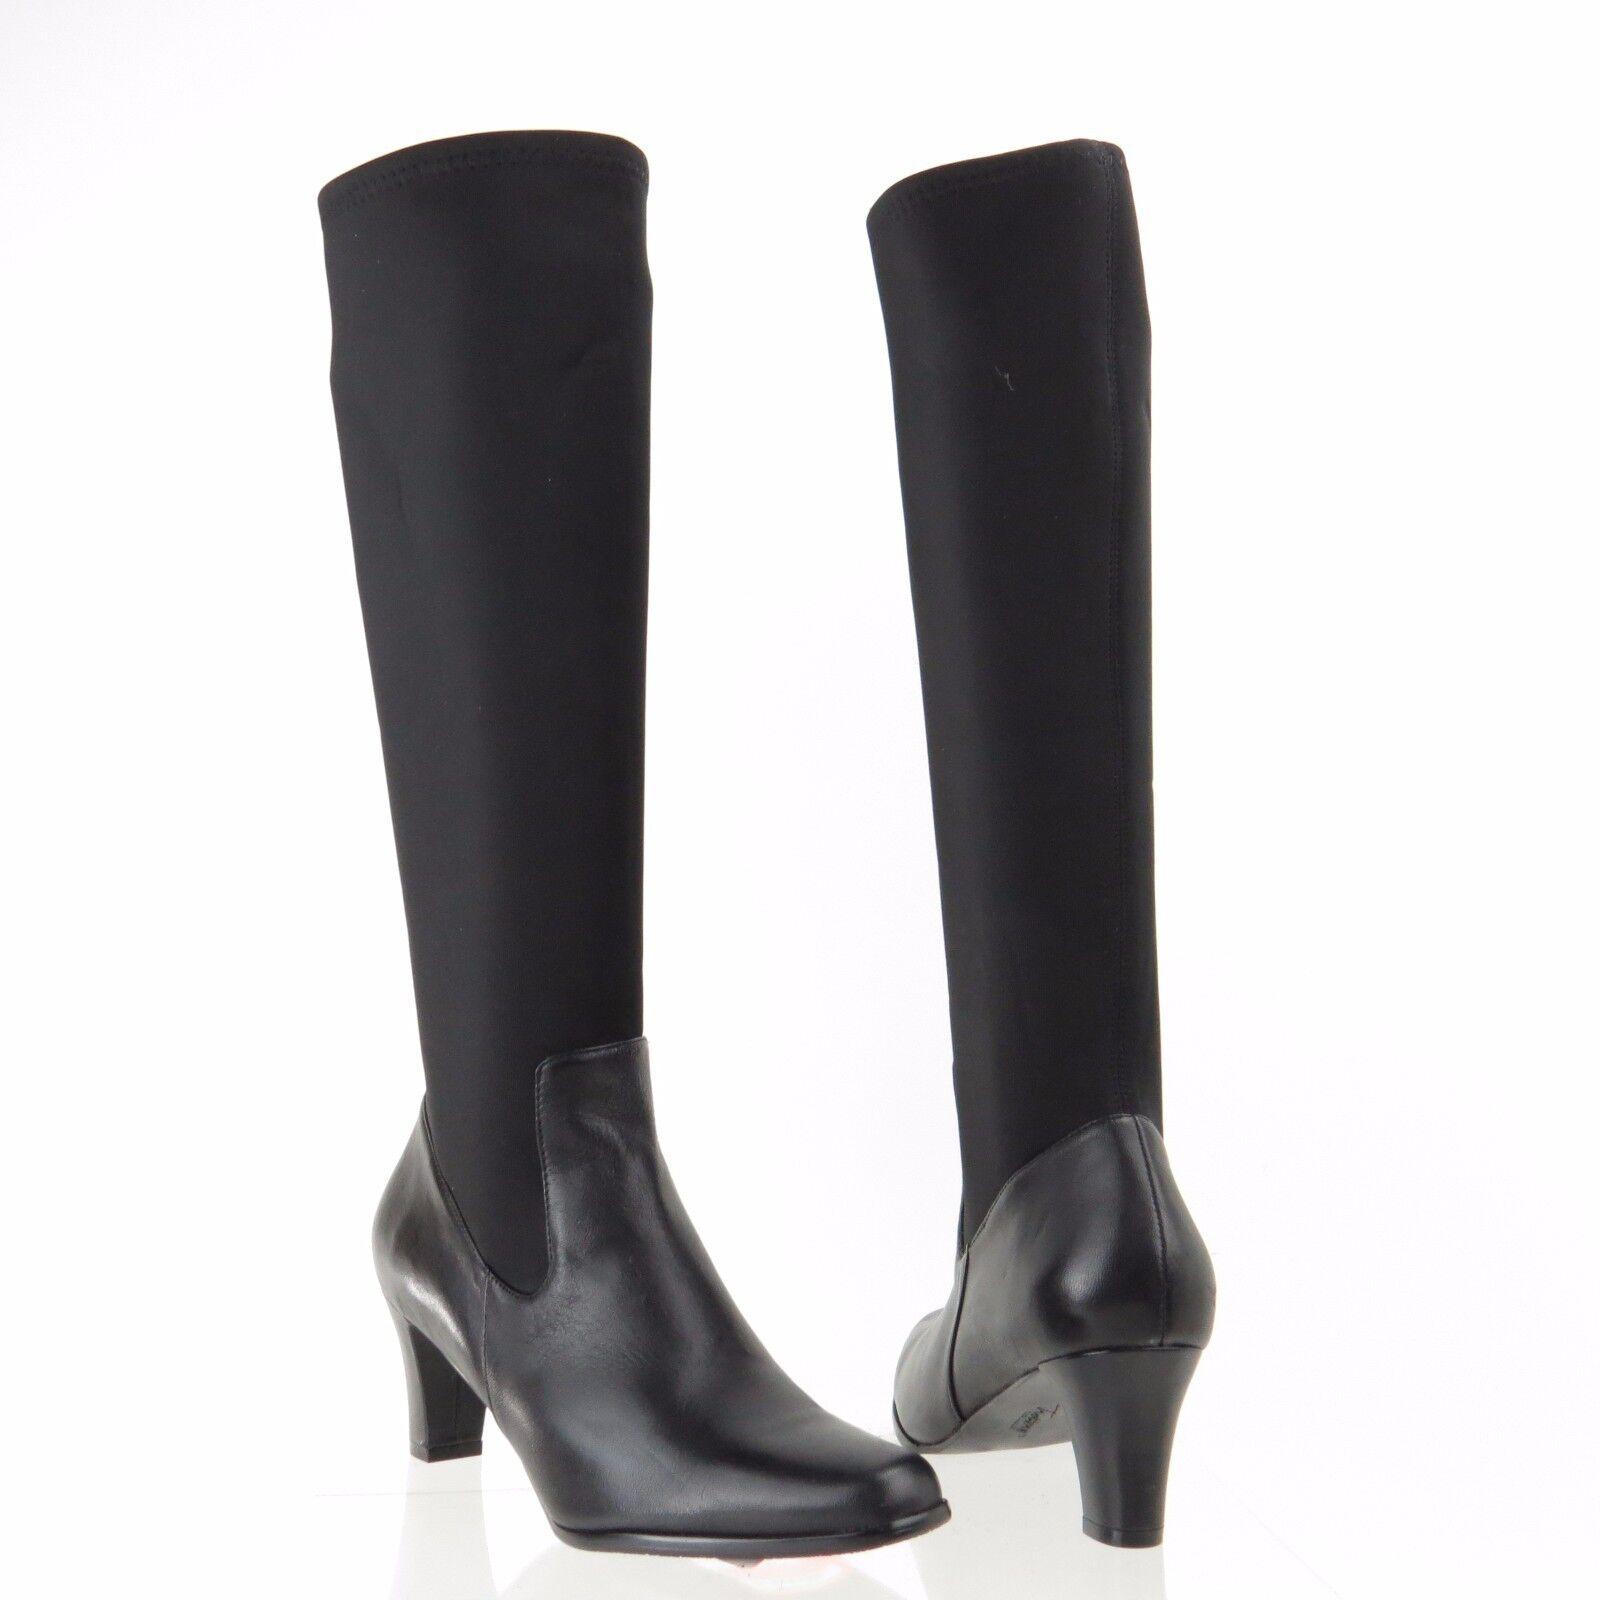 Women's Tredters Jaxson Black Synthetic Square Toe Knee High Boots Size 6 M NEW